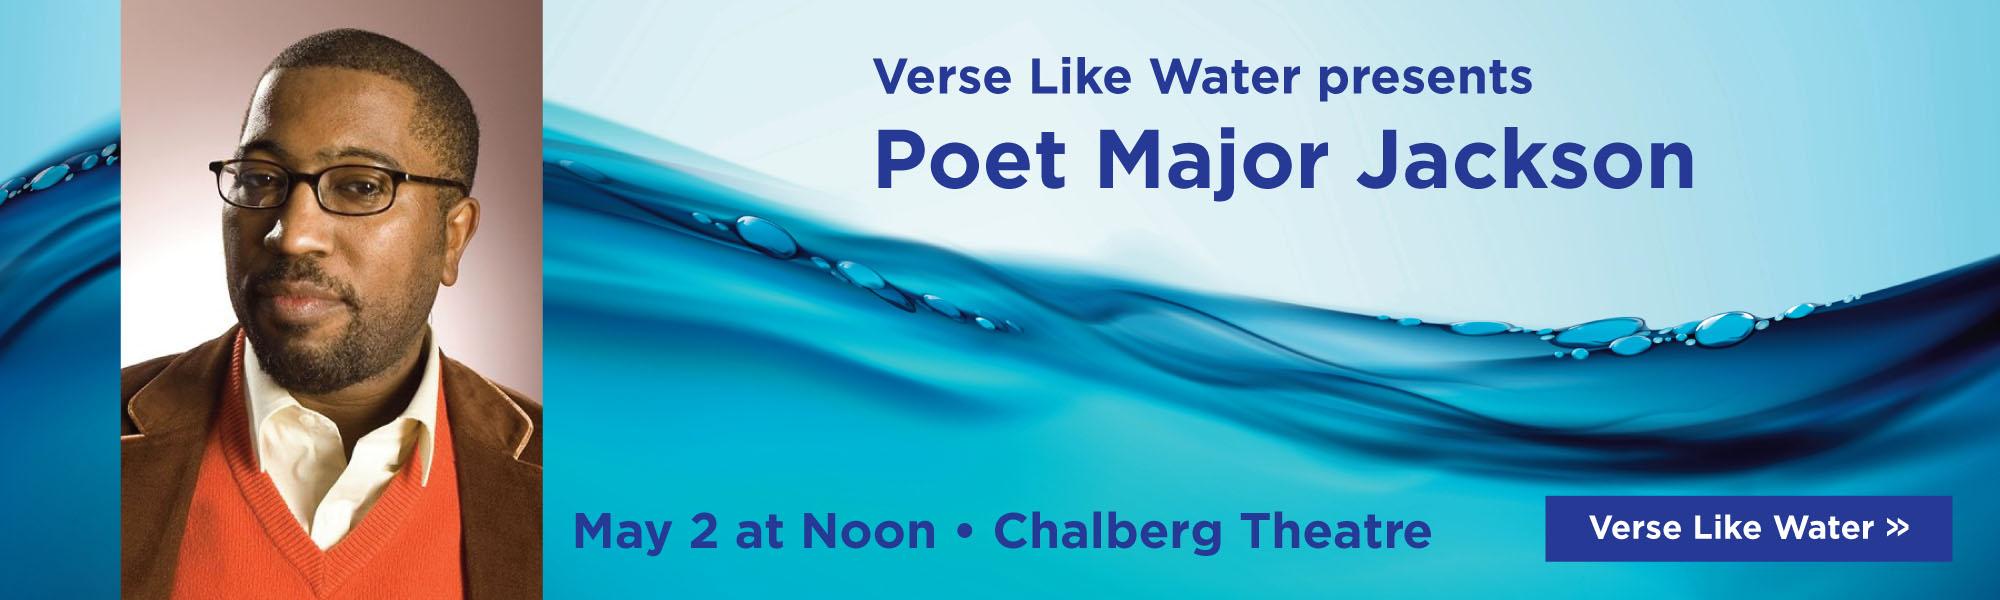 verse like water